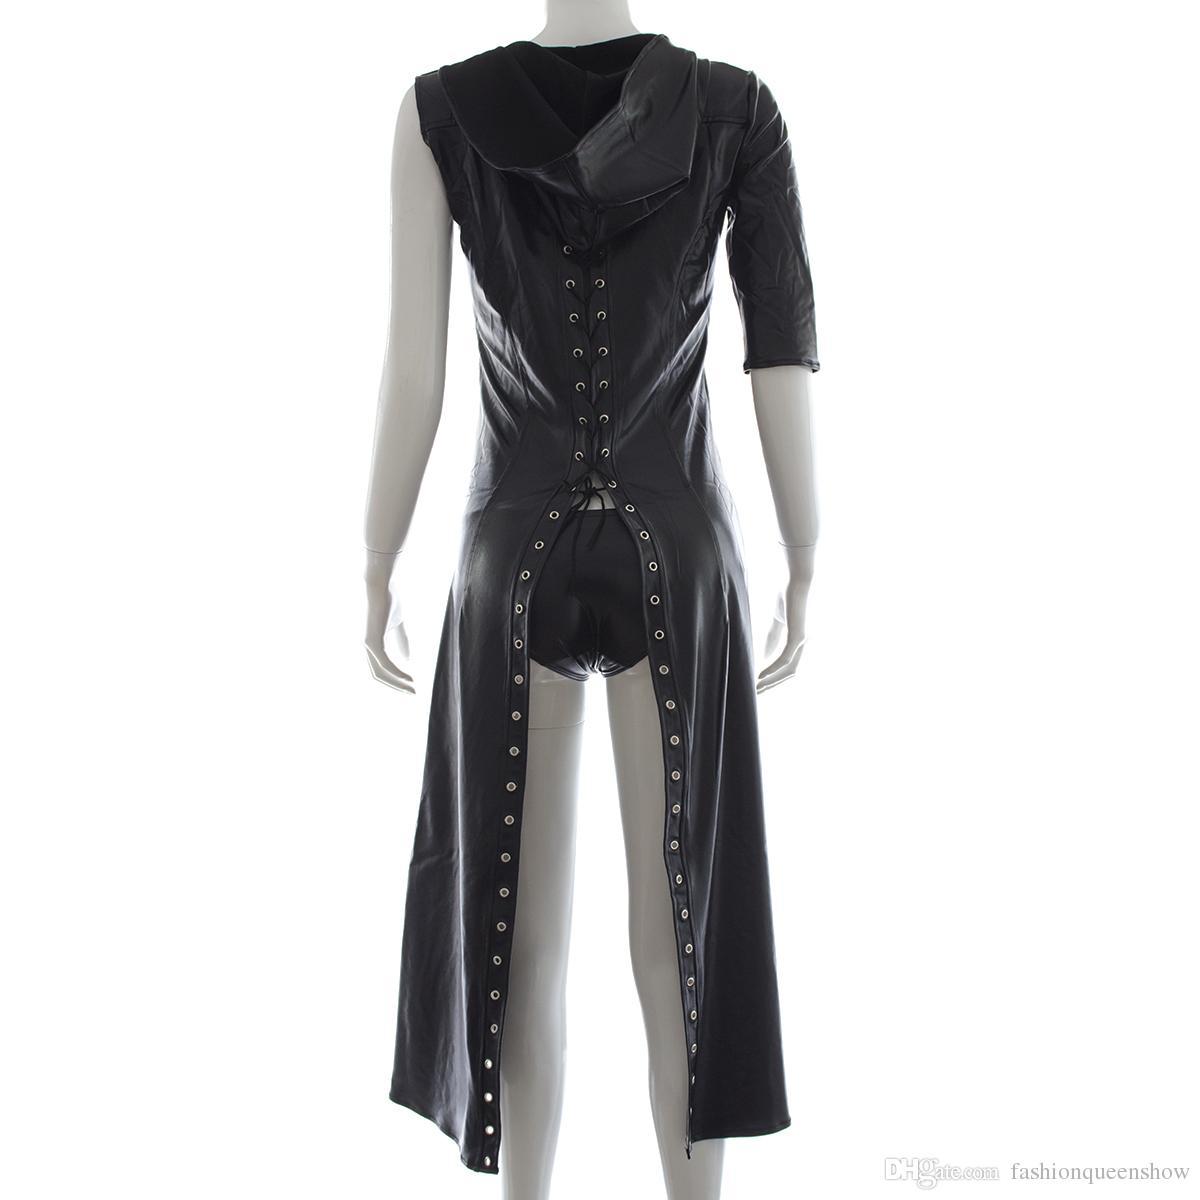 Femmes Faux Cuir À Capuche Robe À Lacets Gothique Knight Un Manches Manteau Manteau Clubwear Halloween Fantaisie Robe